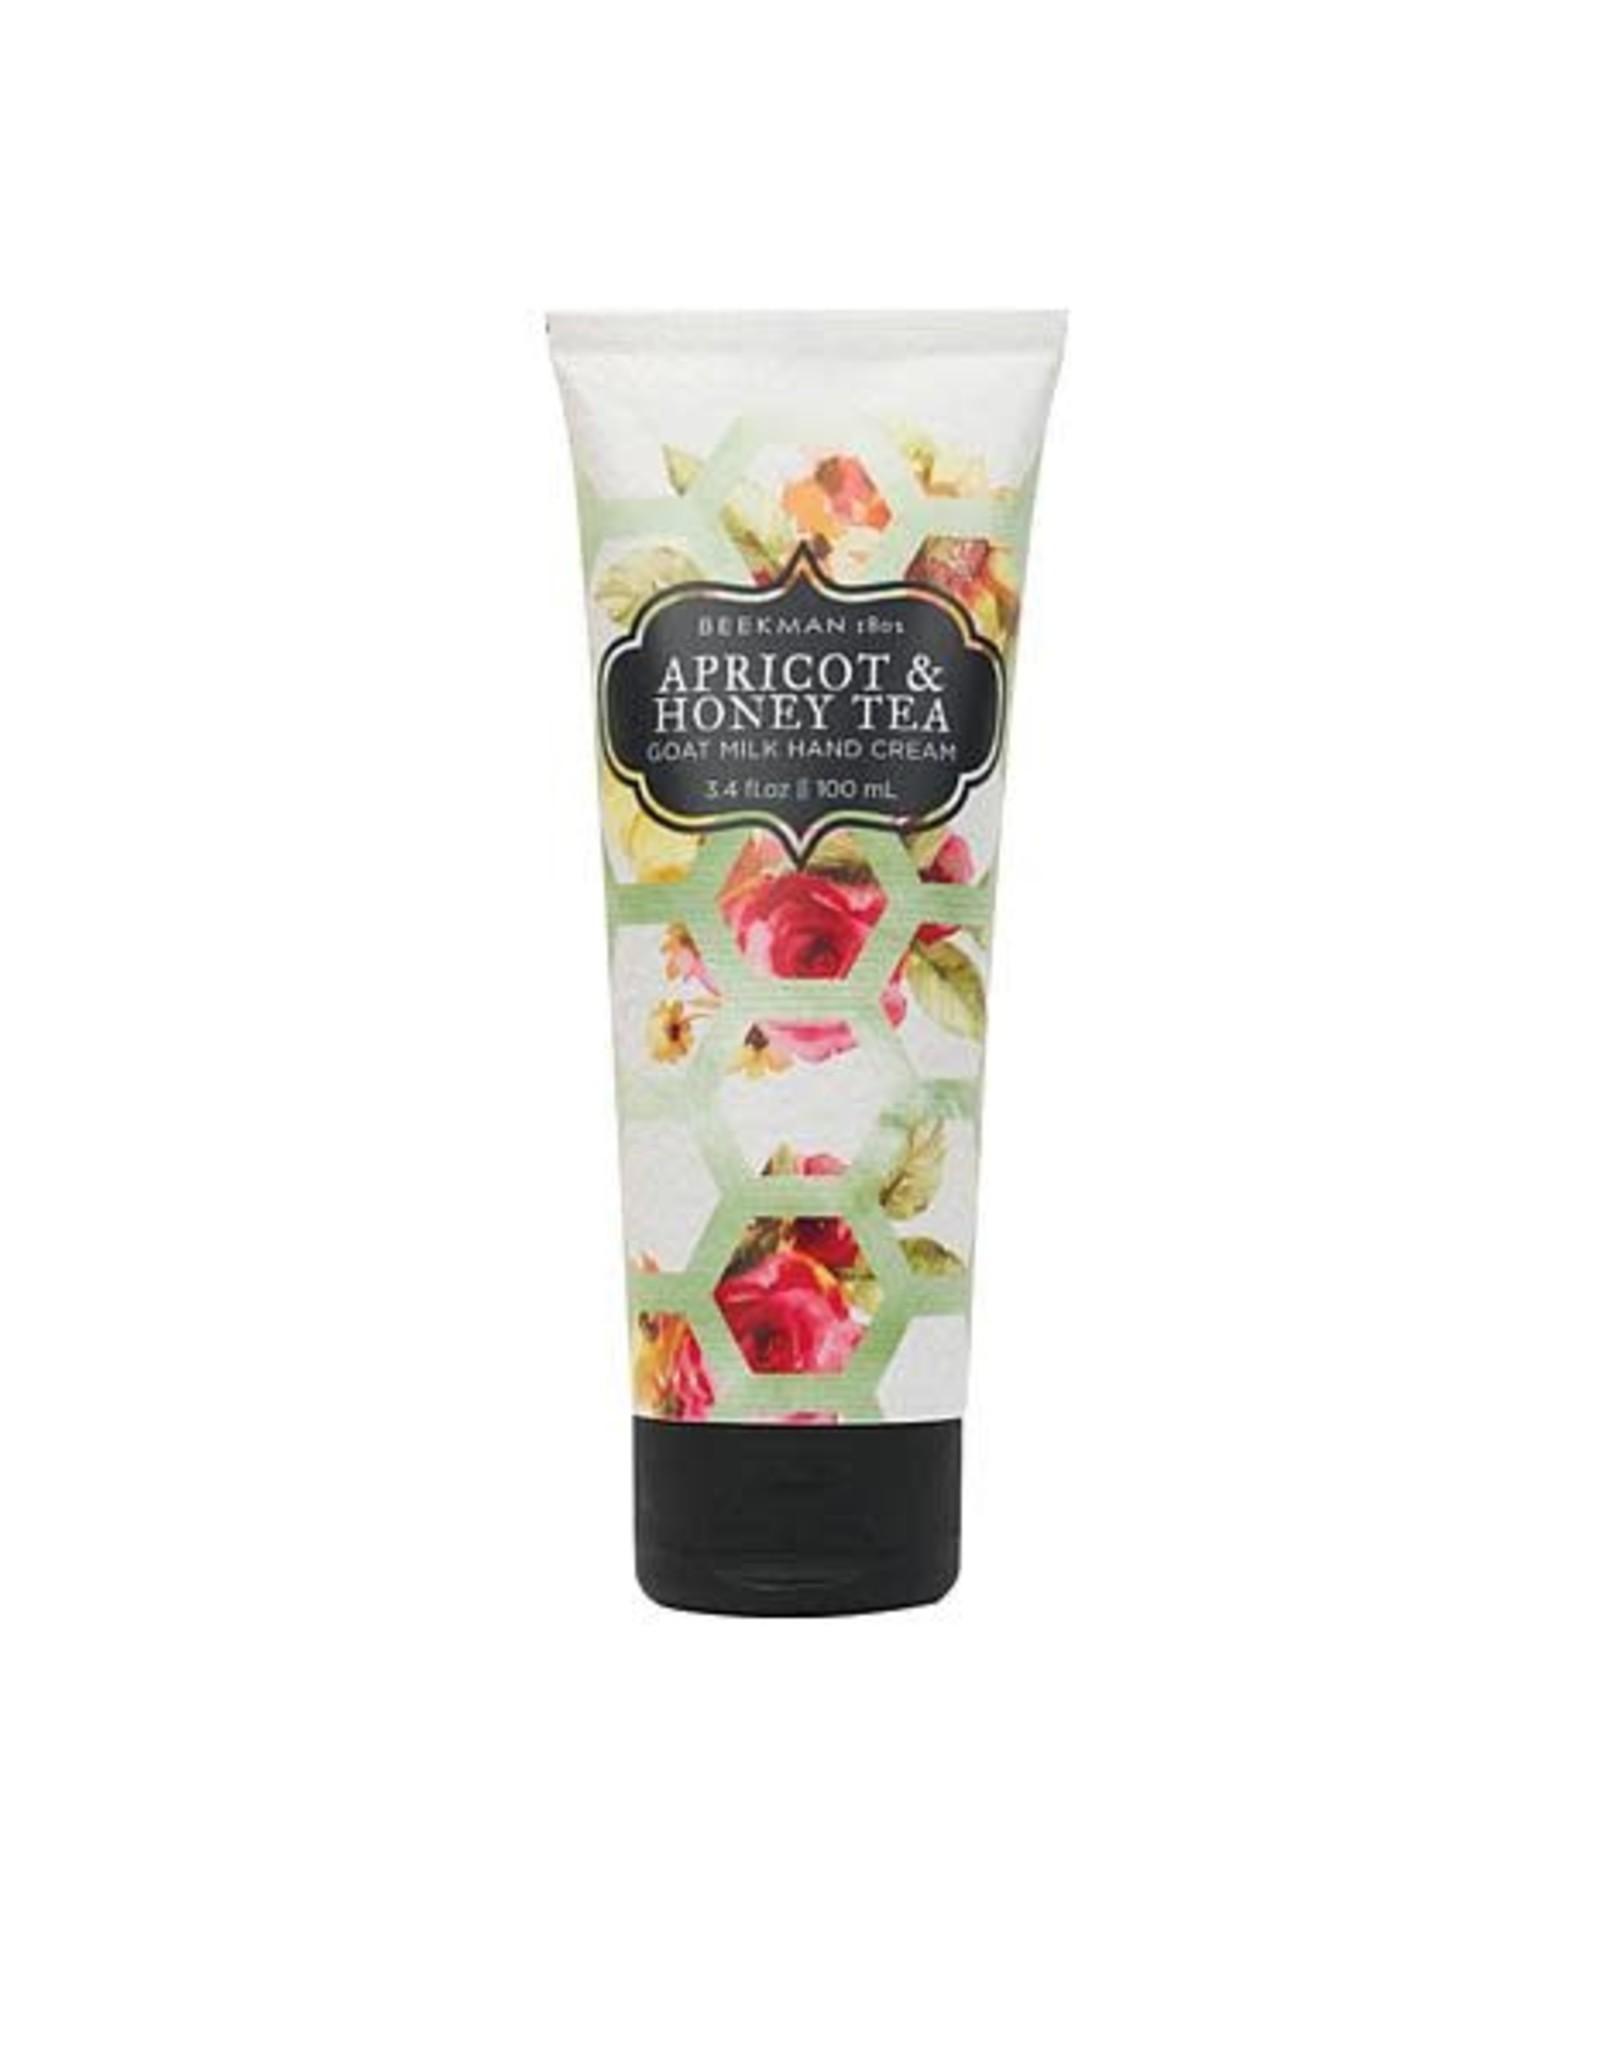 Beekman 1802, Inc Apricot & Honey Tea Hand Cream